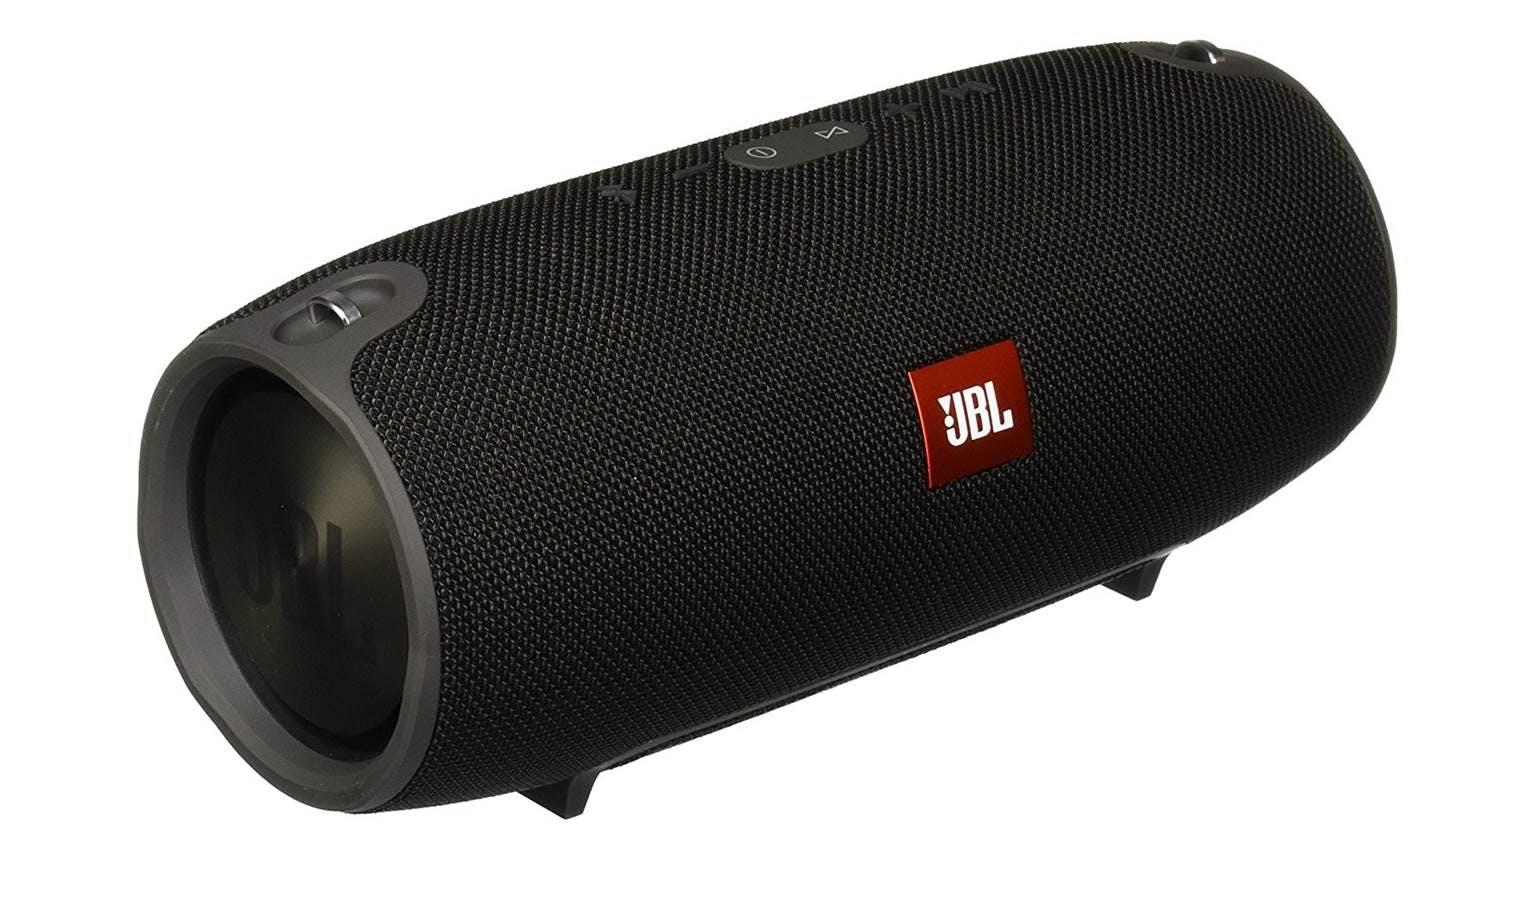 JBL Xtreme Portable Bluetooth Speaker - Black